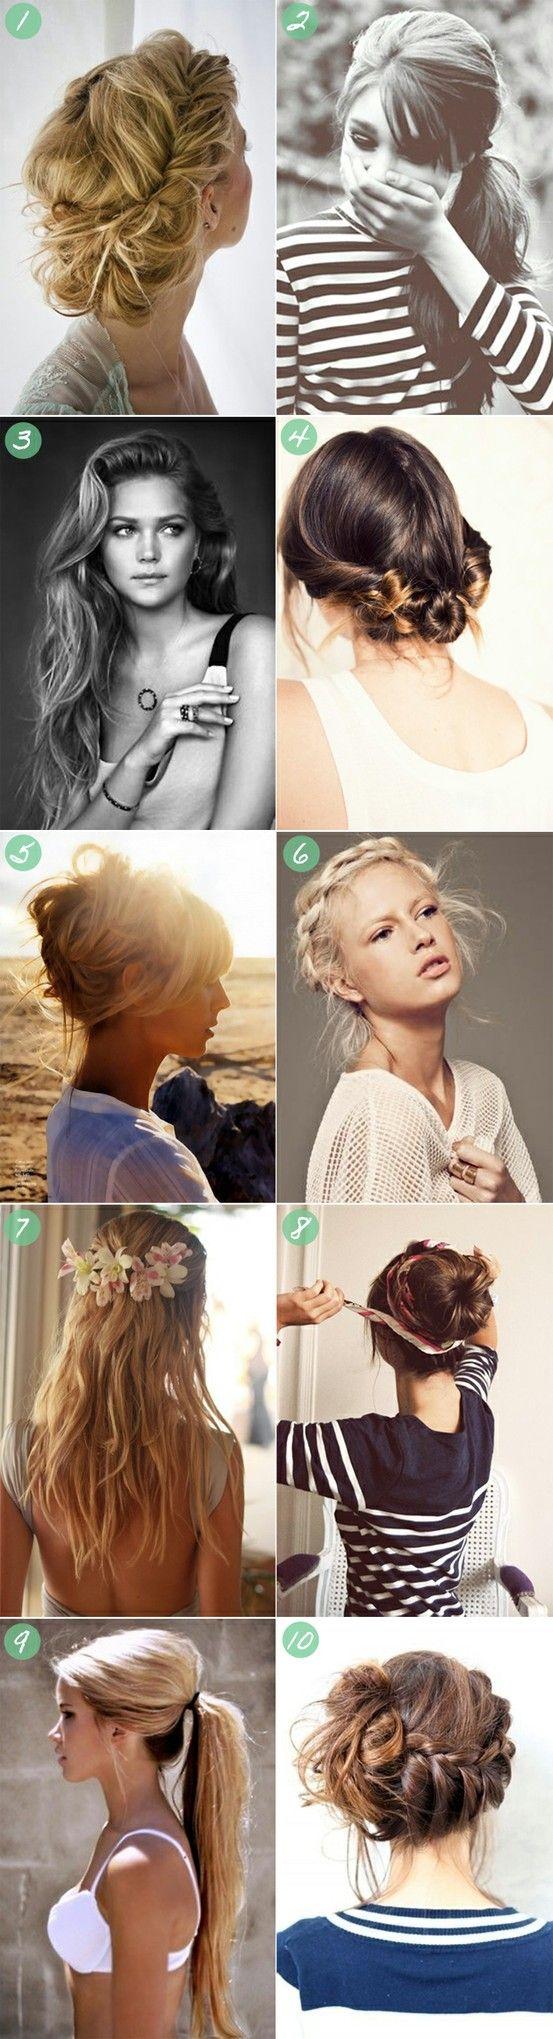 10 summer hair styles